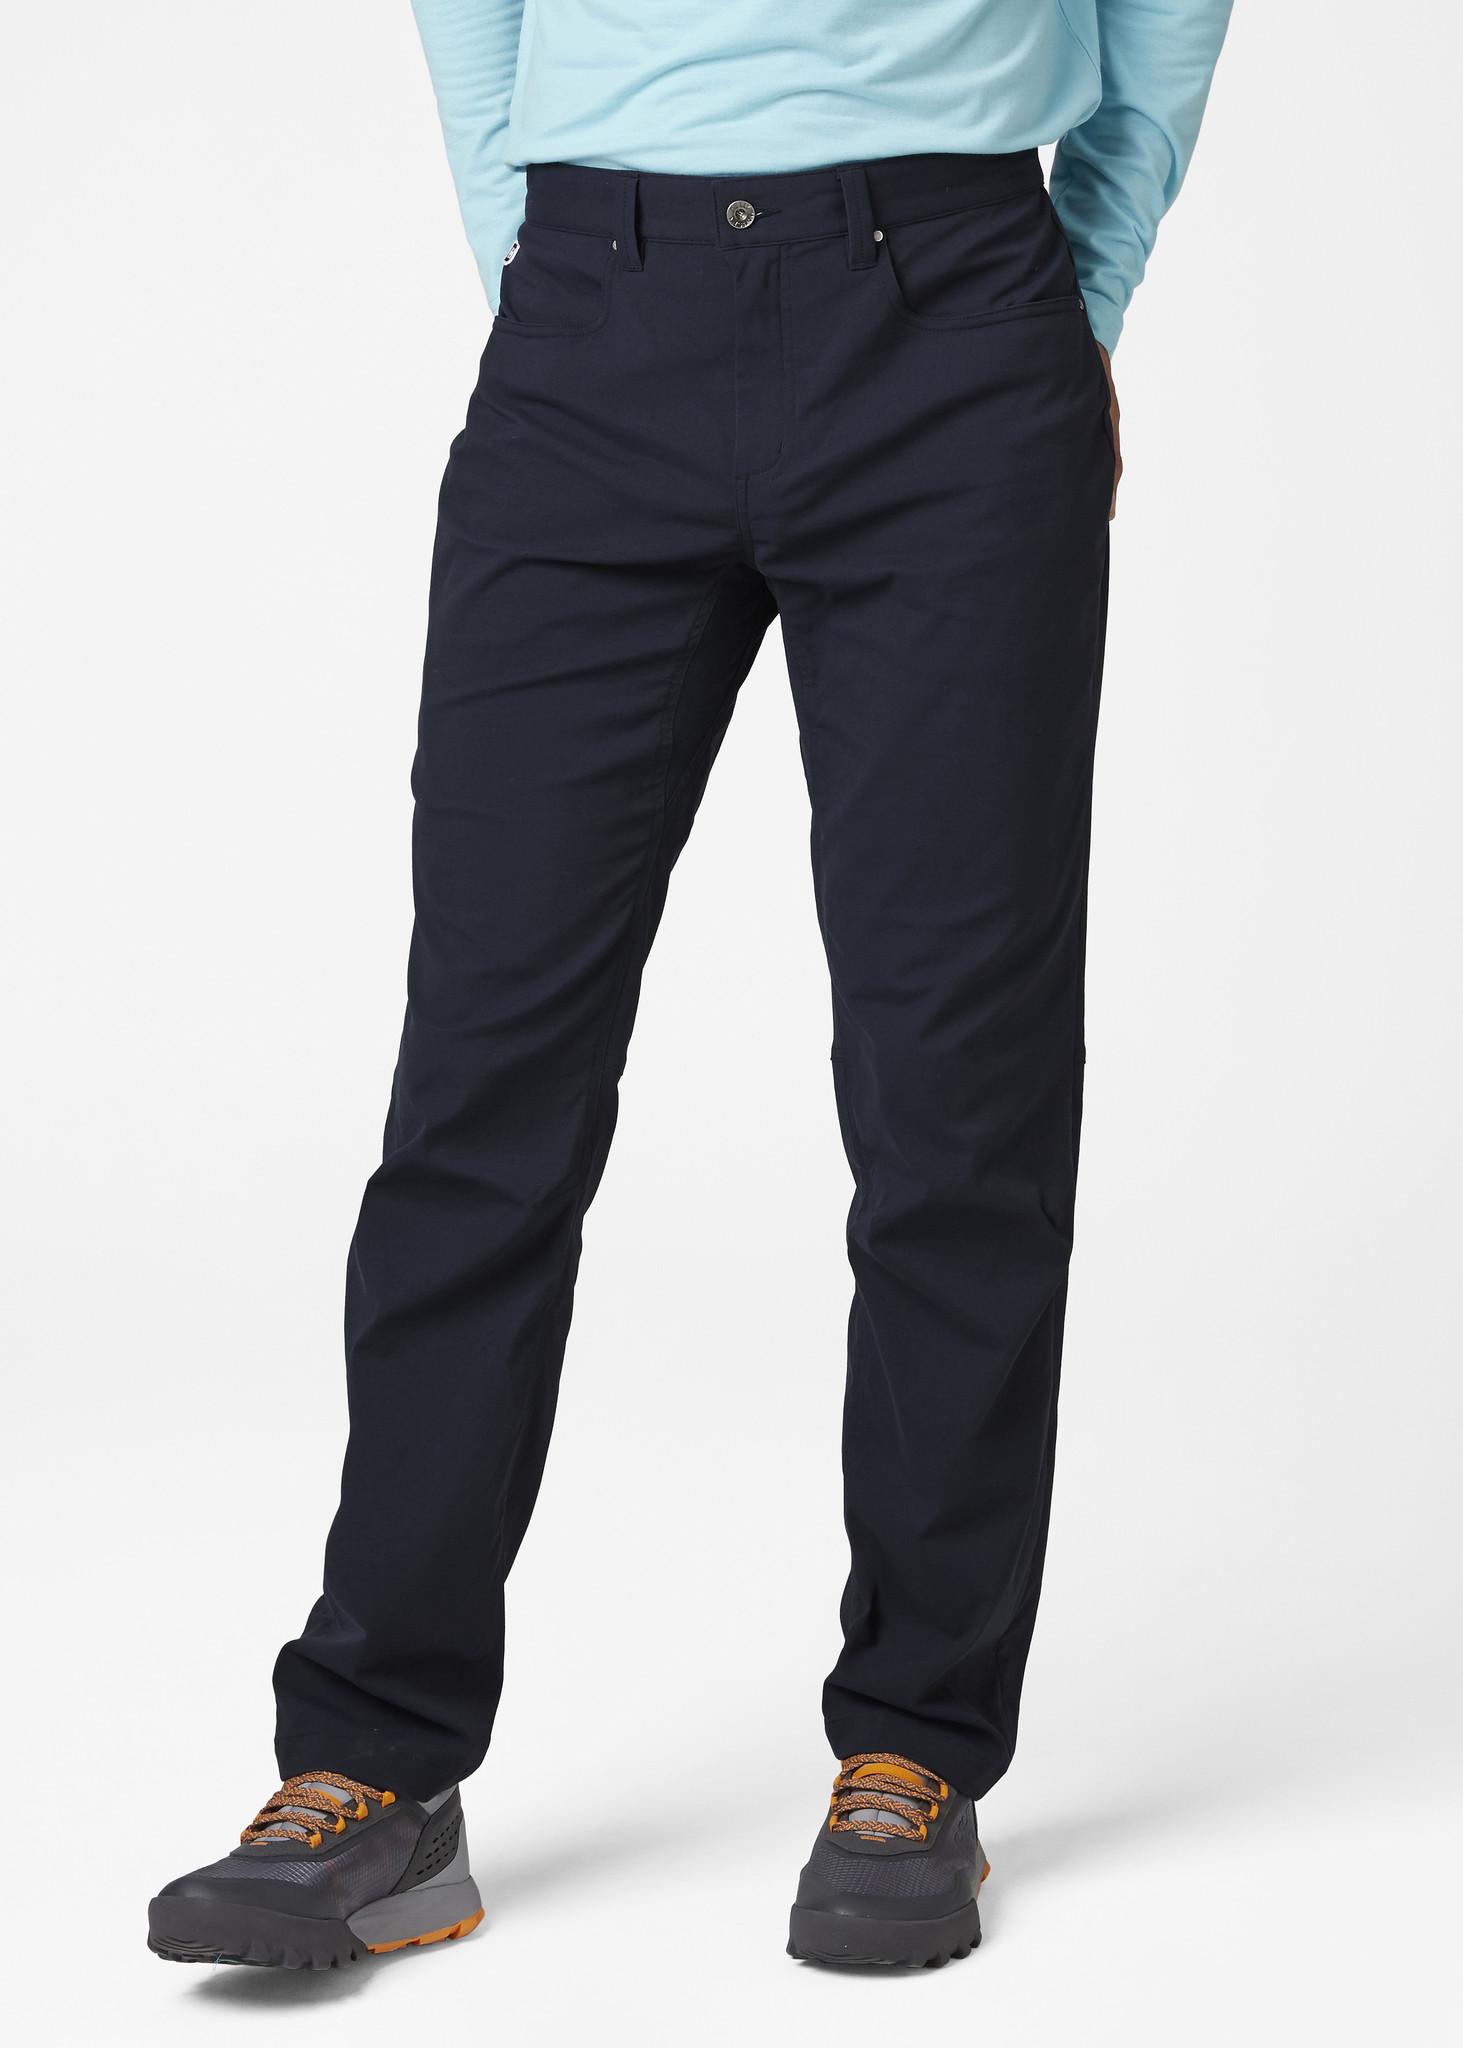 Holmen 5 Pocket Pant - Navy